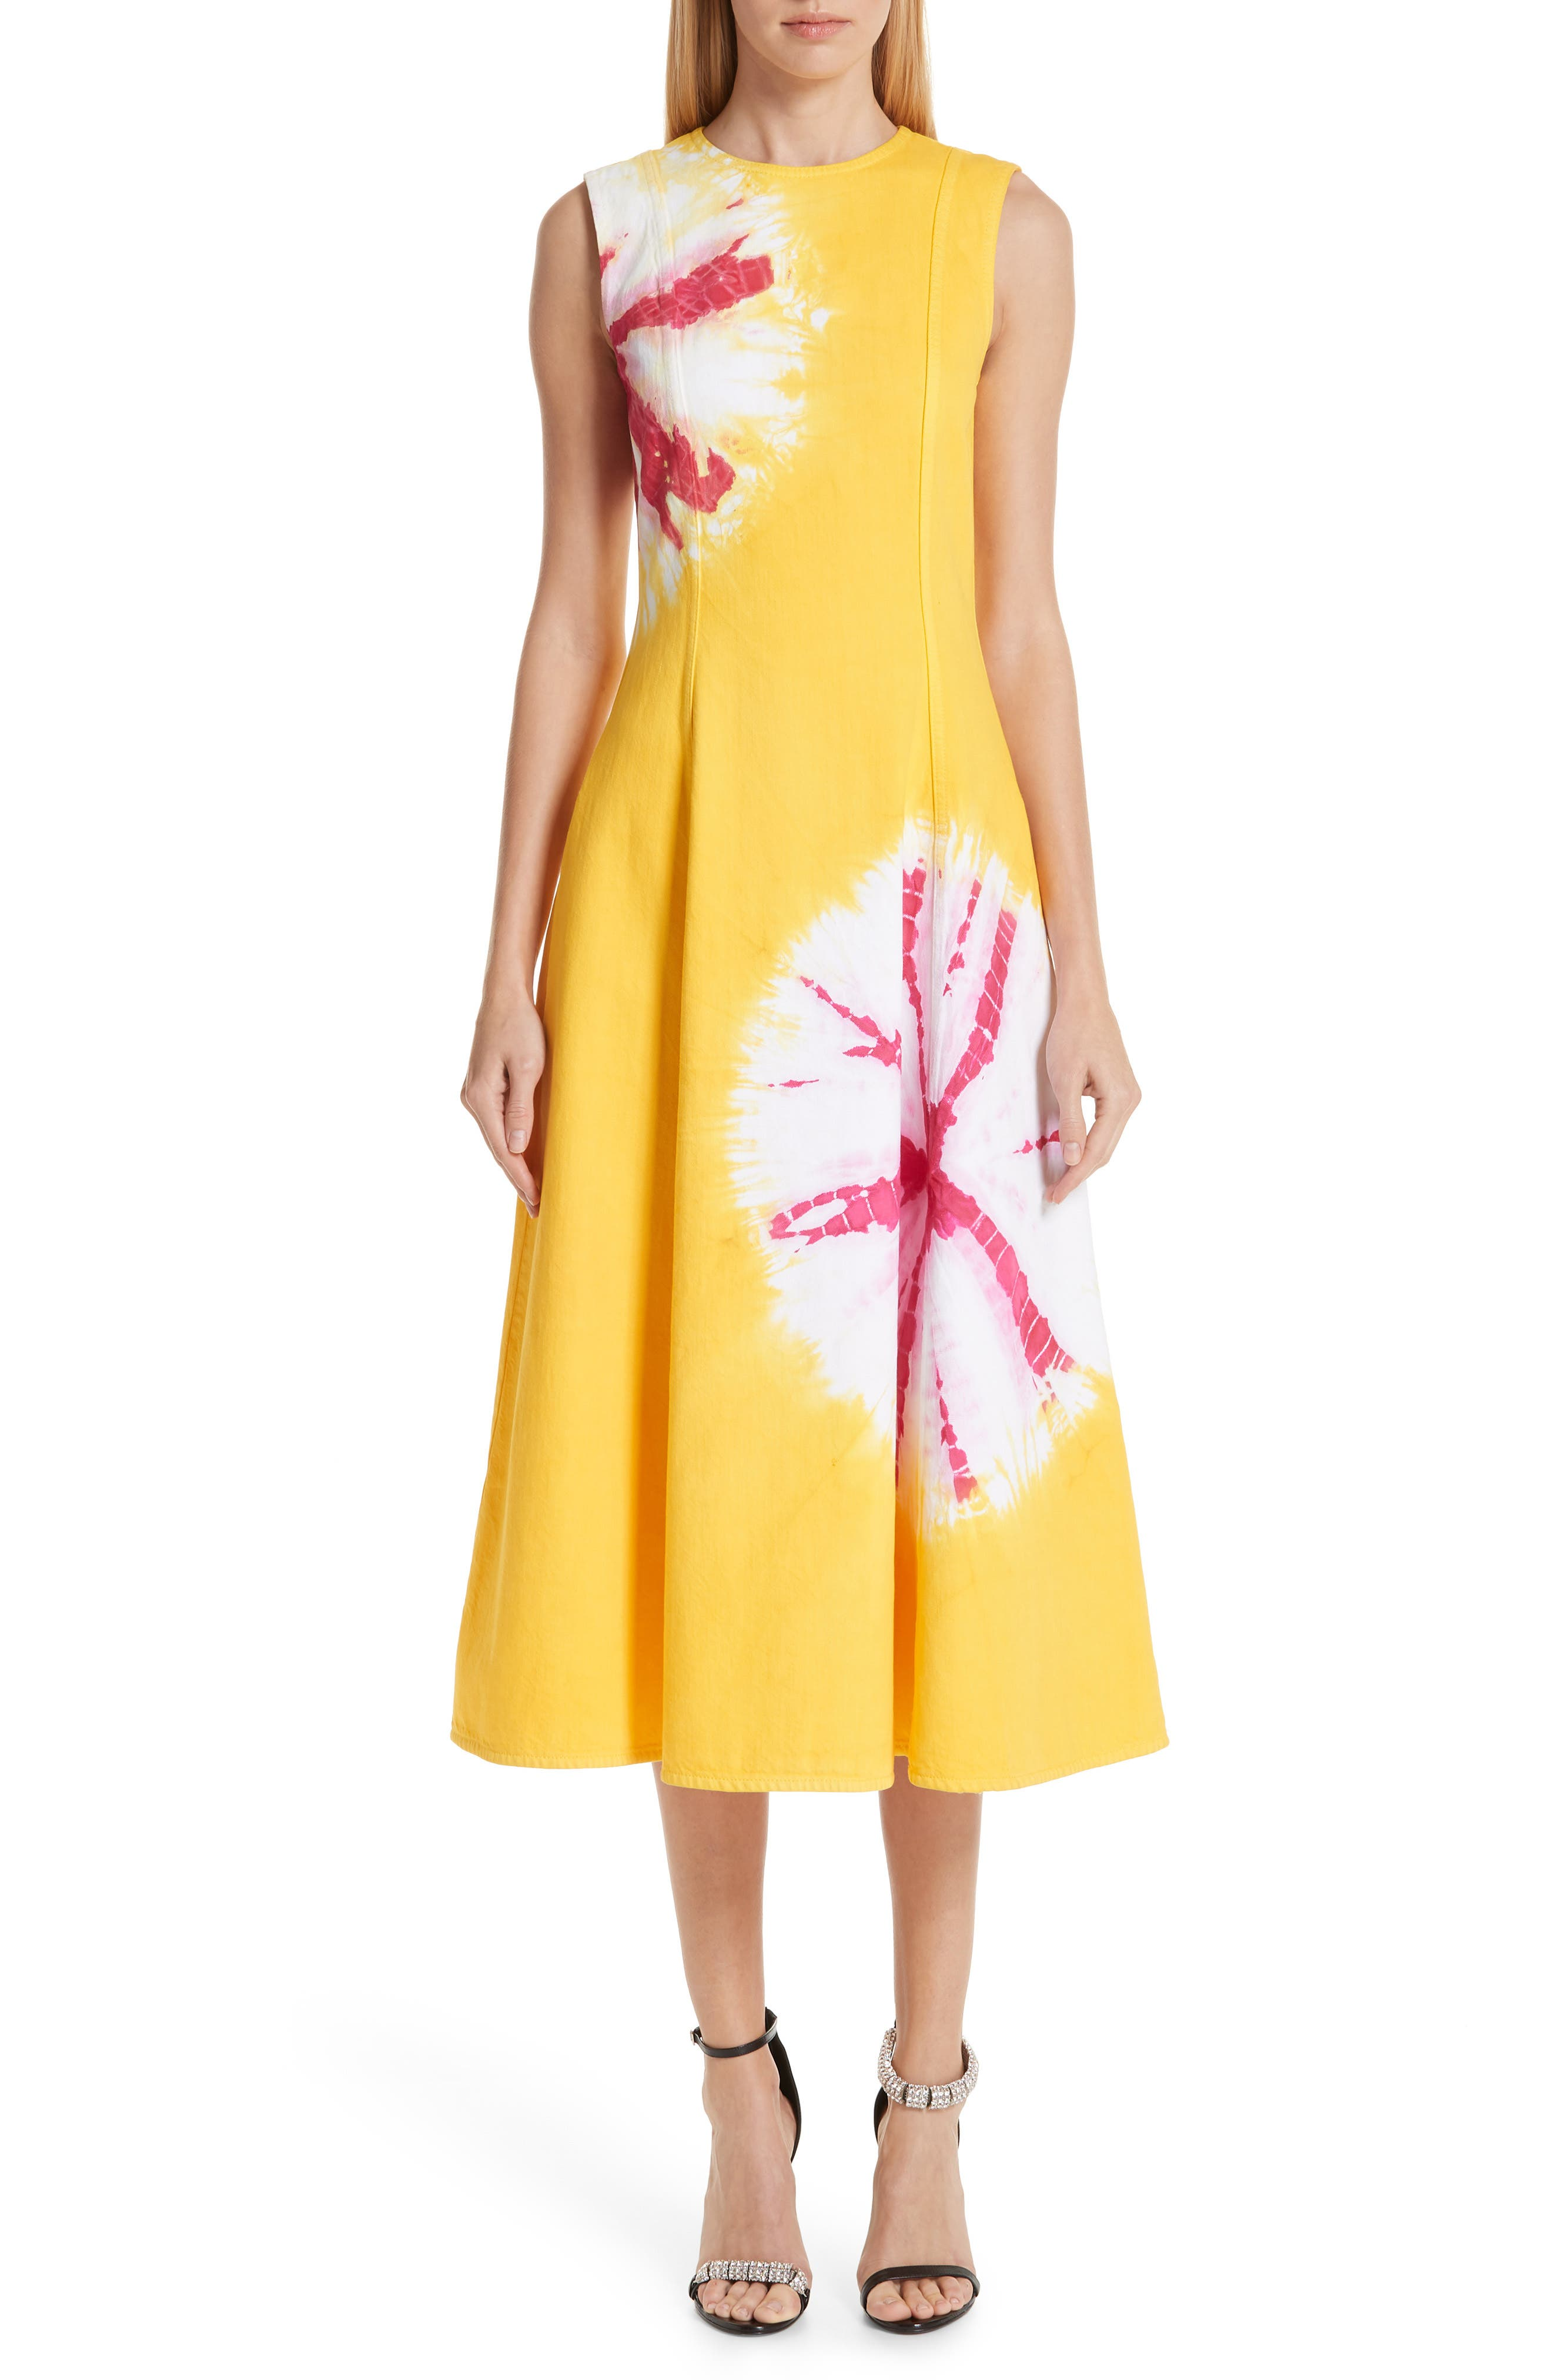 Calvin Klein 205W39Nyc Tie Dye Fit & Flare Midi Dress, 6 IT - Yellow